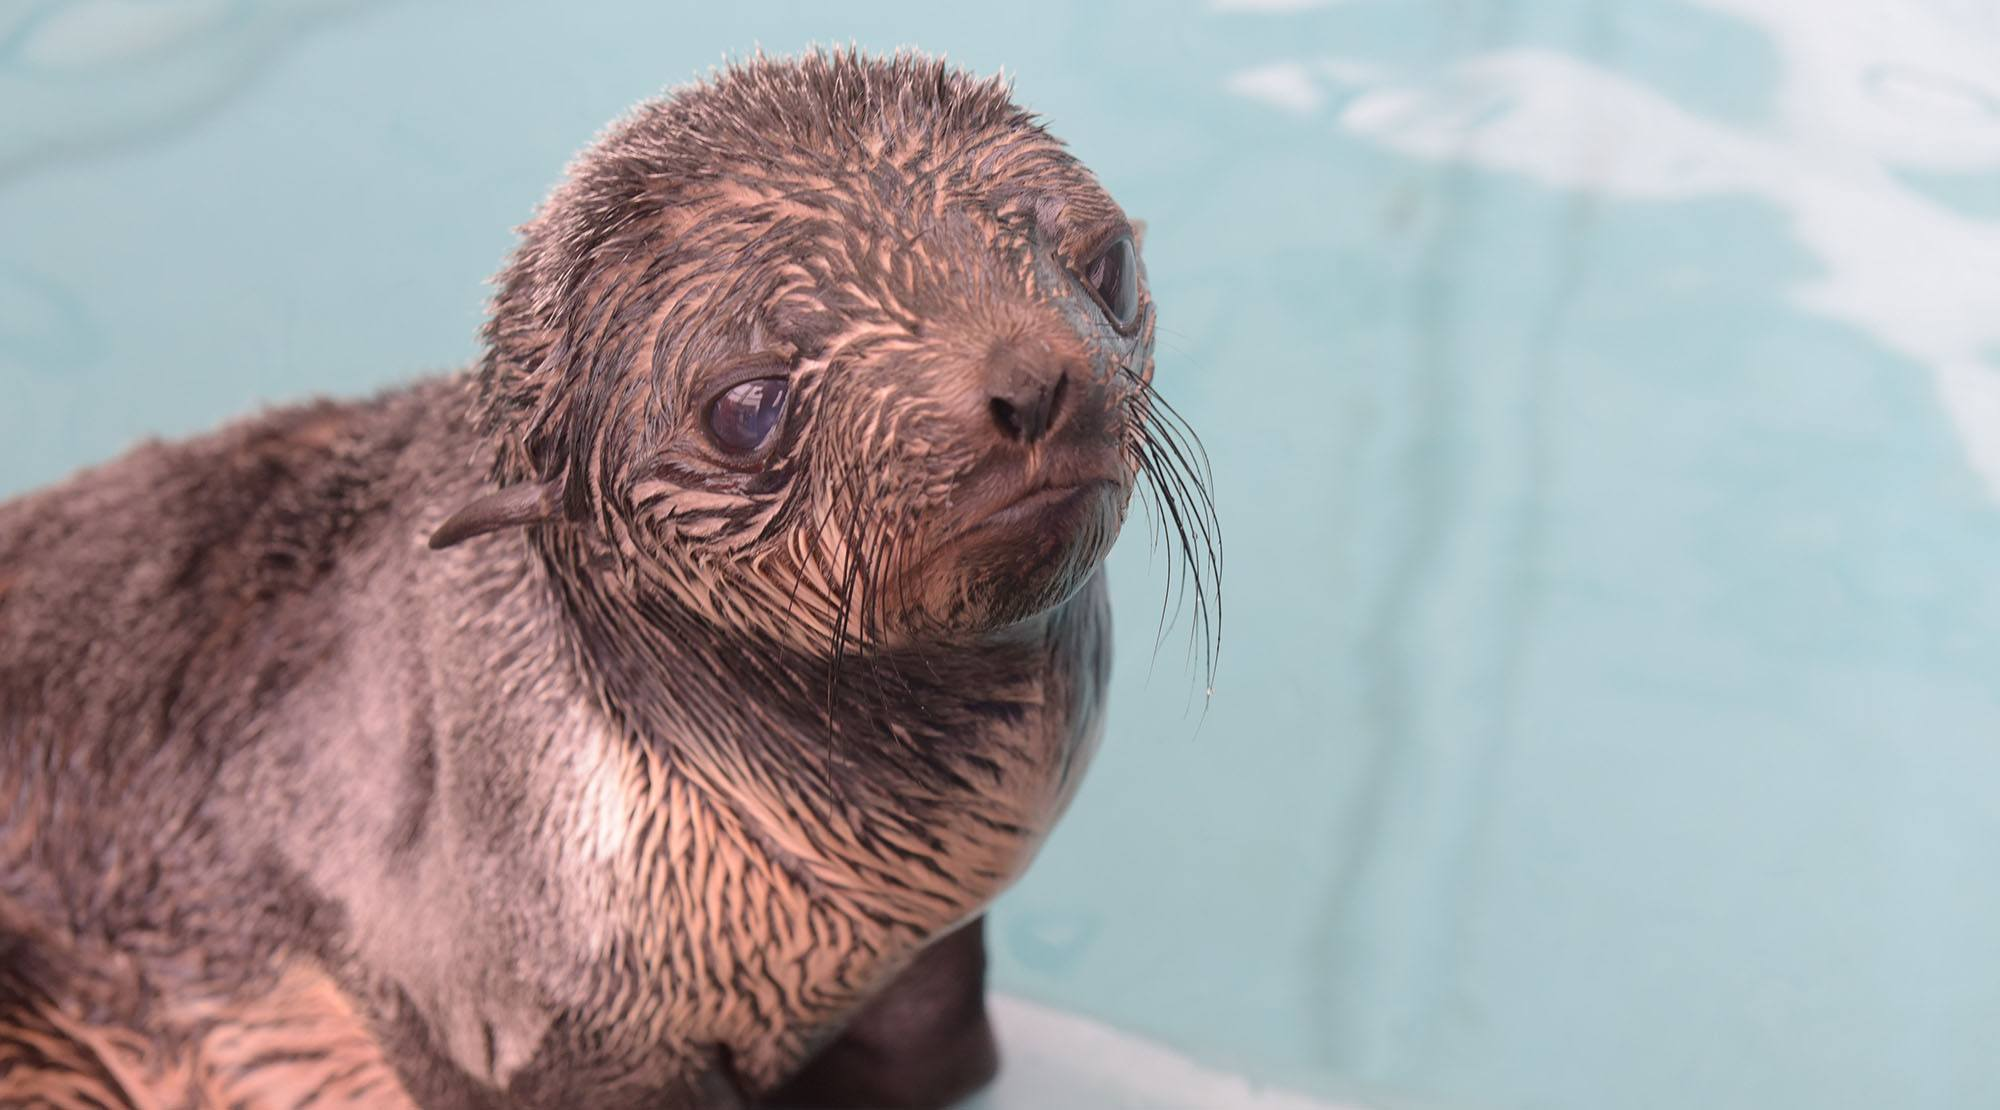 Rescued northern fur seal pup recovering at Vancouver Aquarium (PHOTOS)